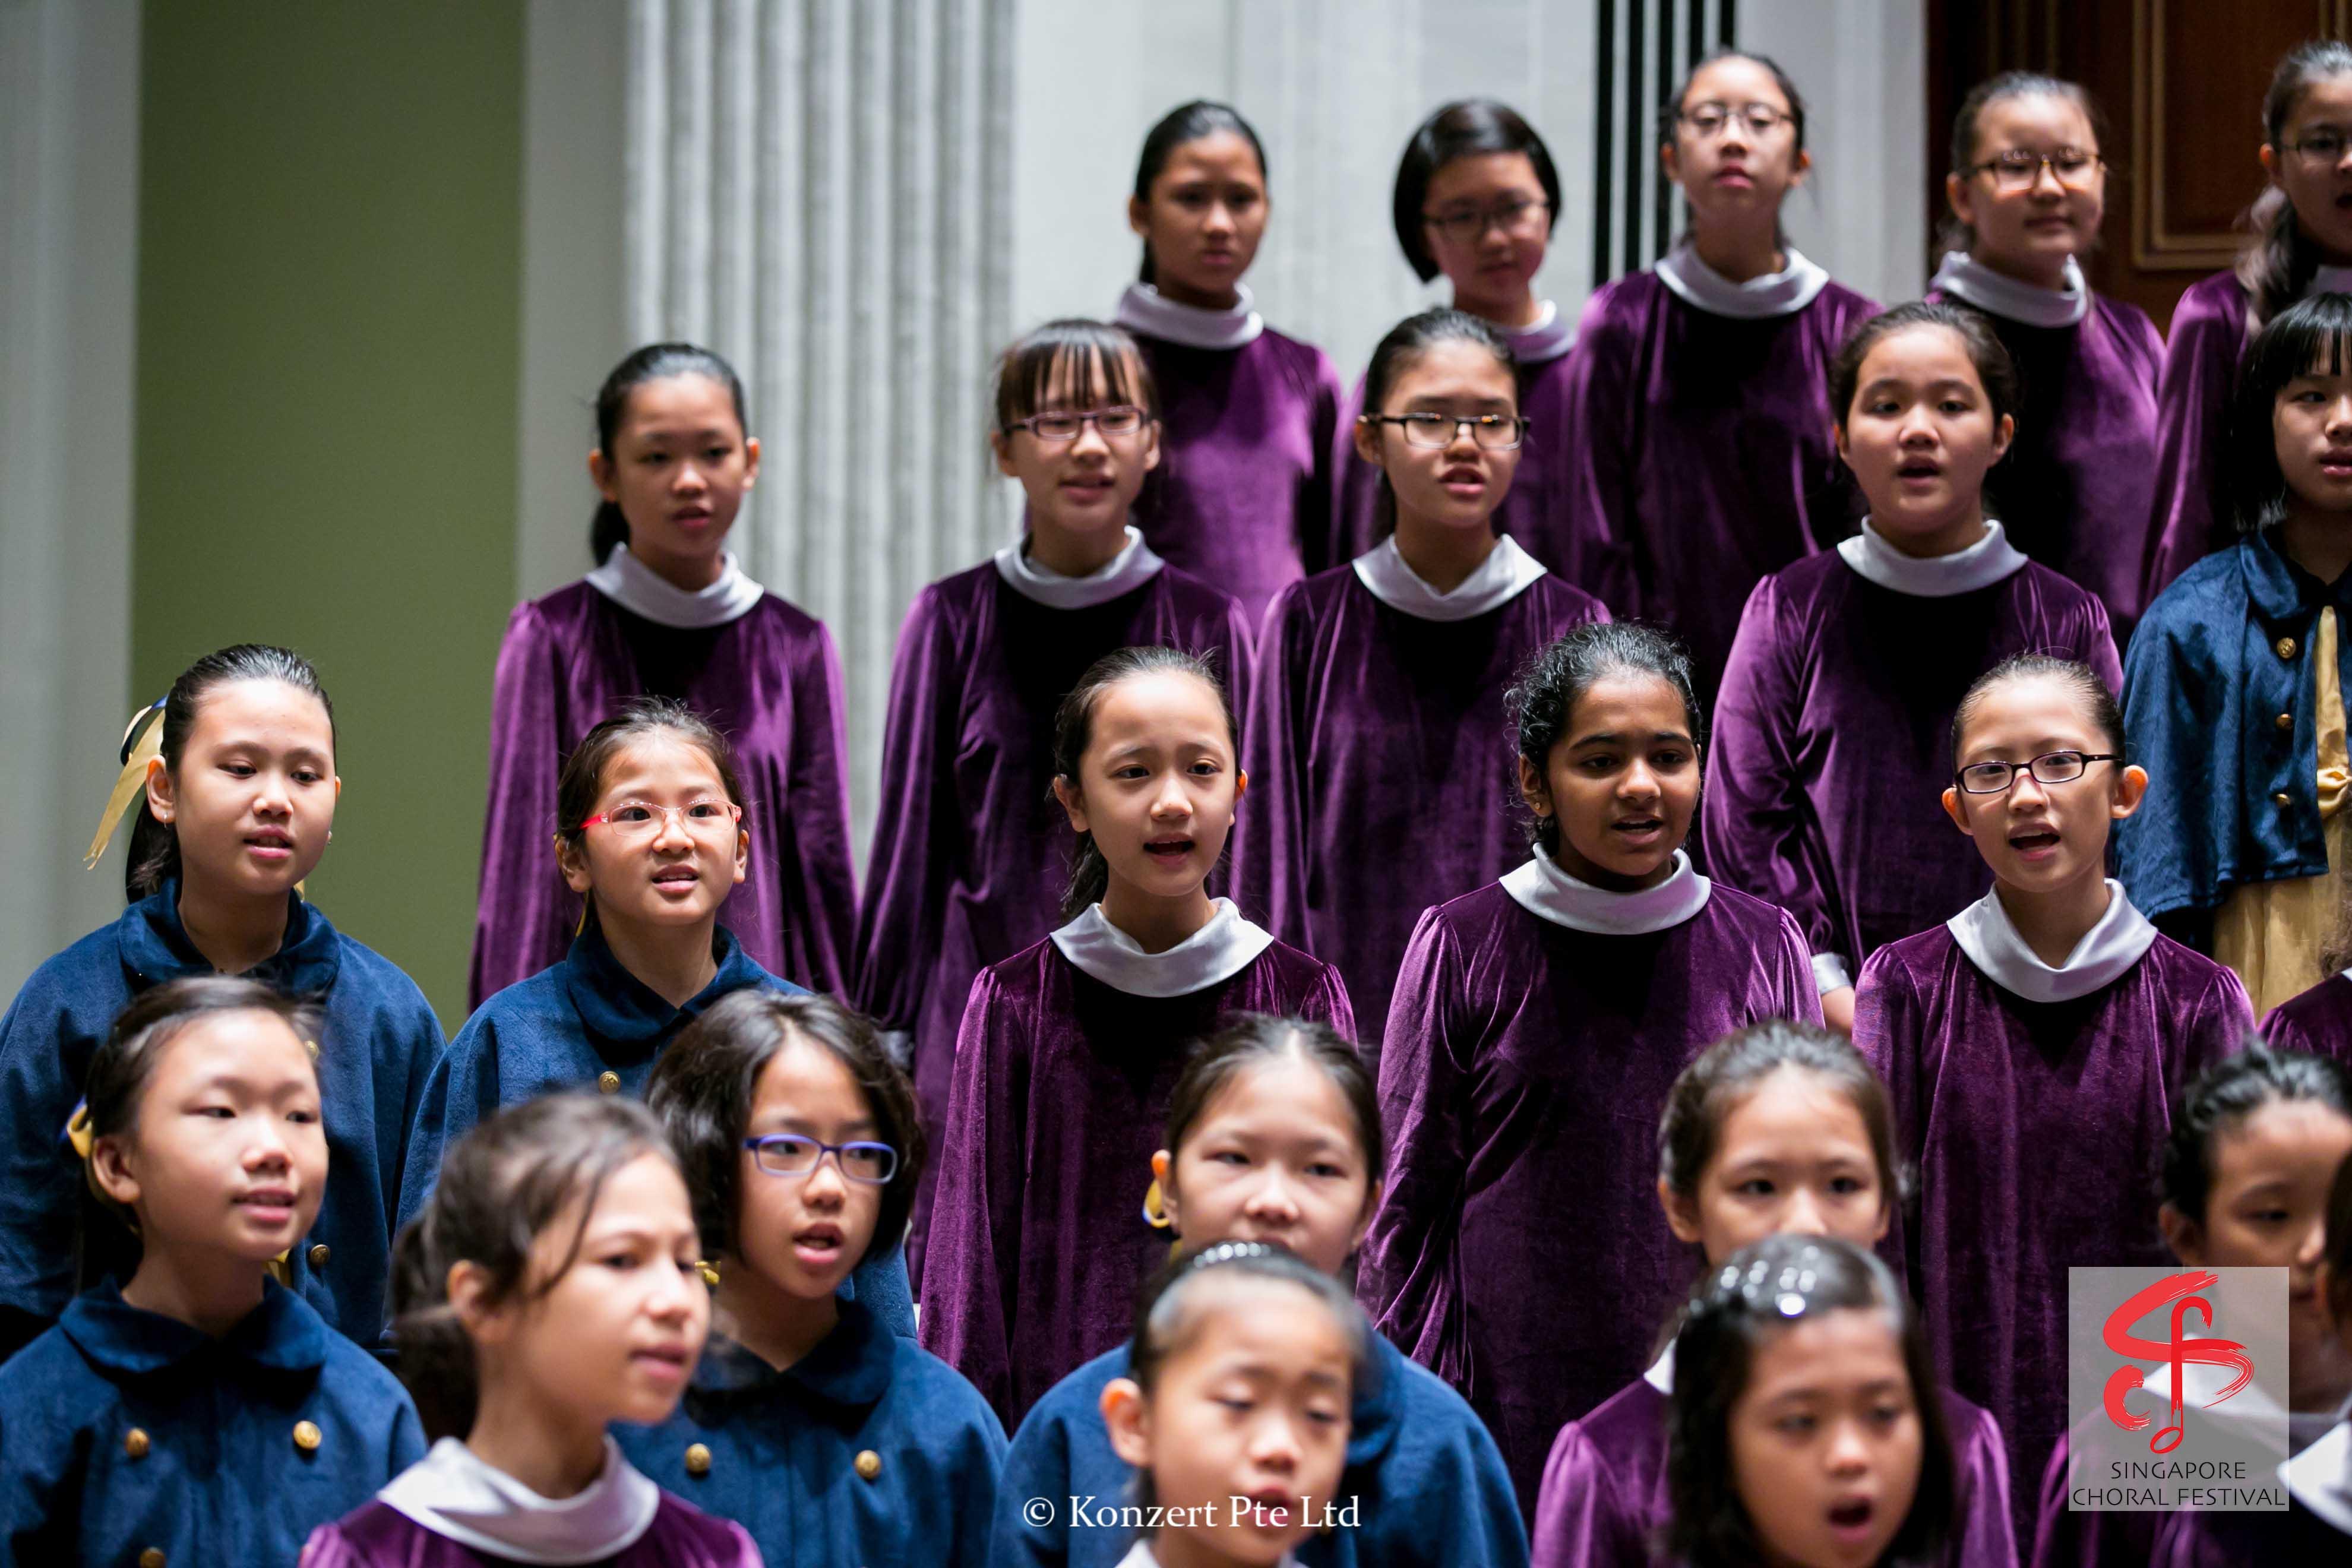 Singapore Choral Festival 8-8-15 (20).jpg